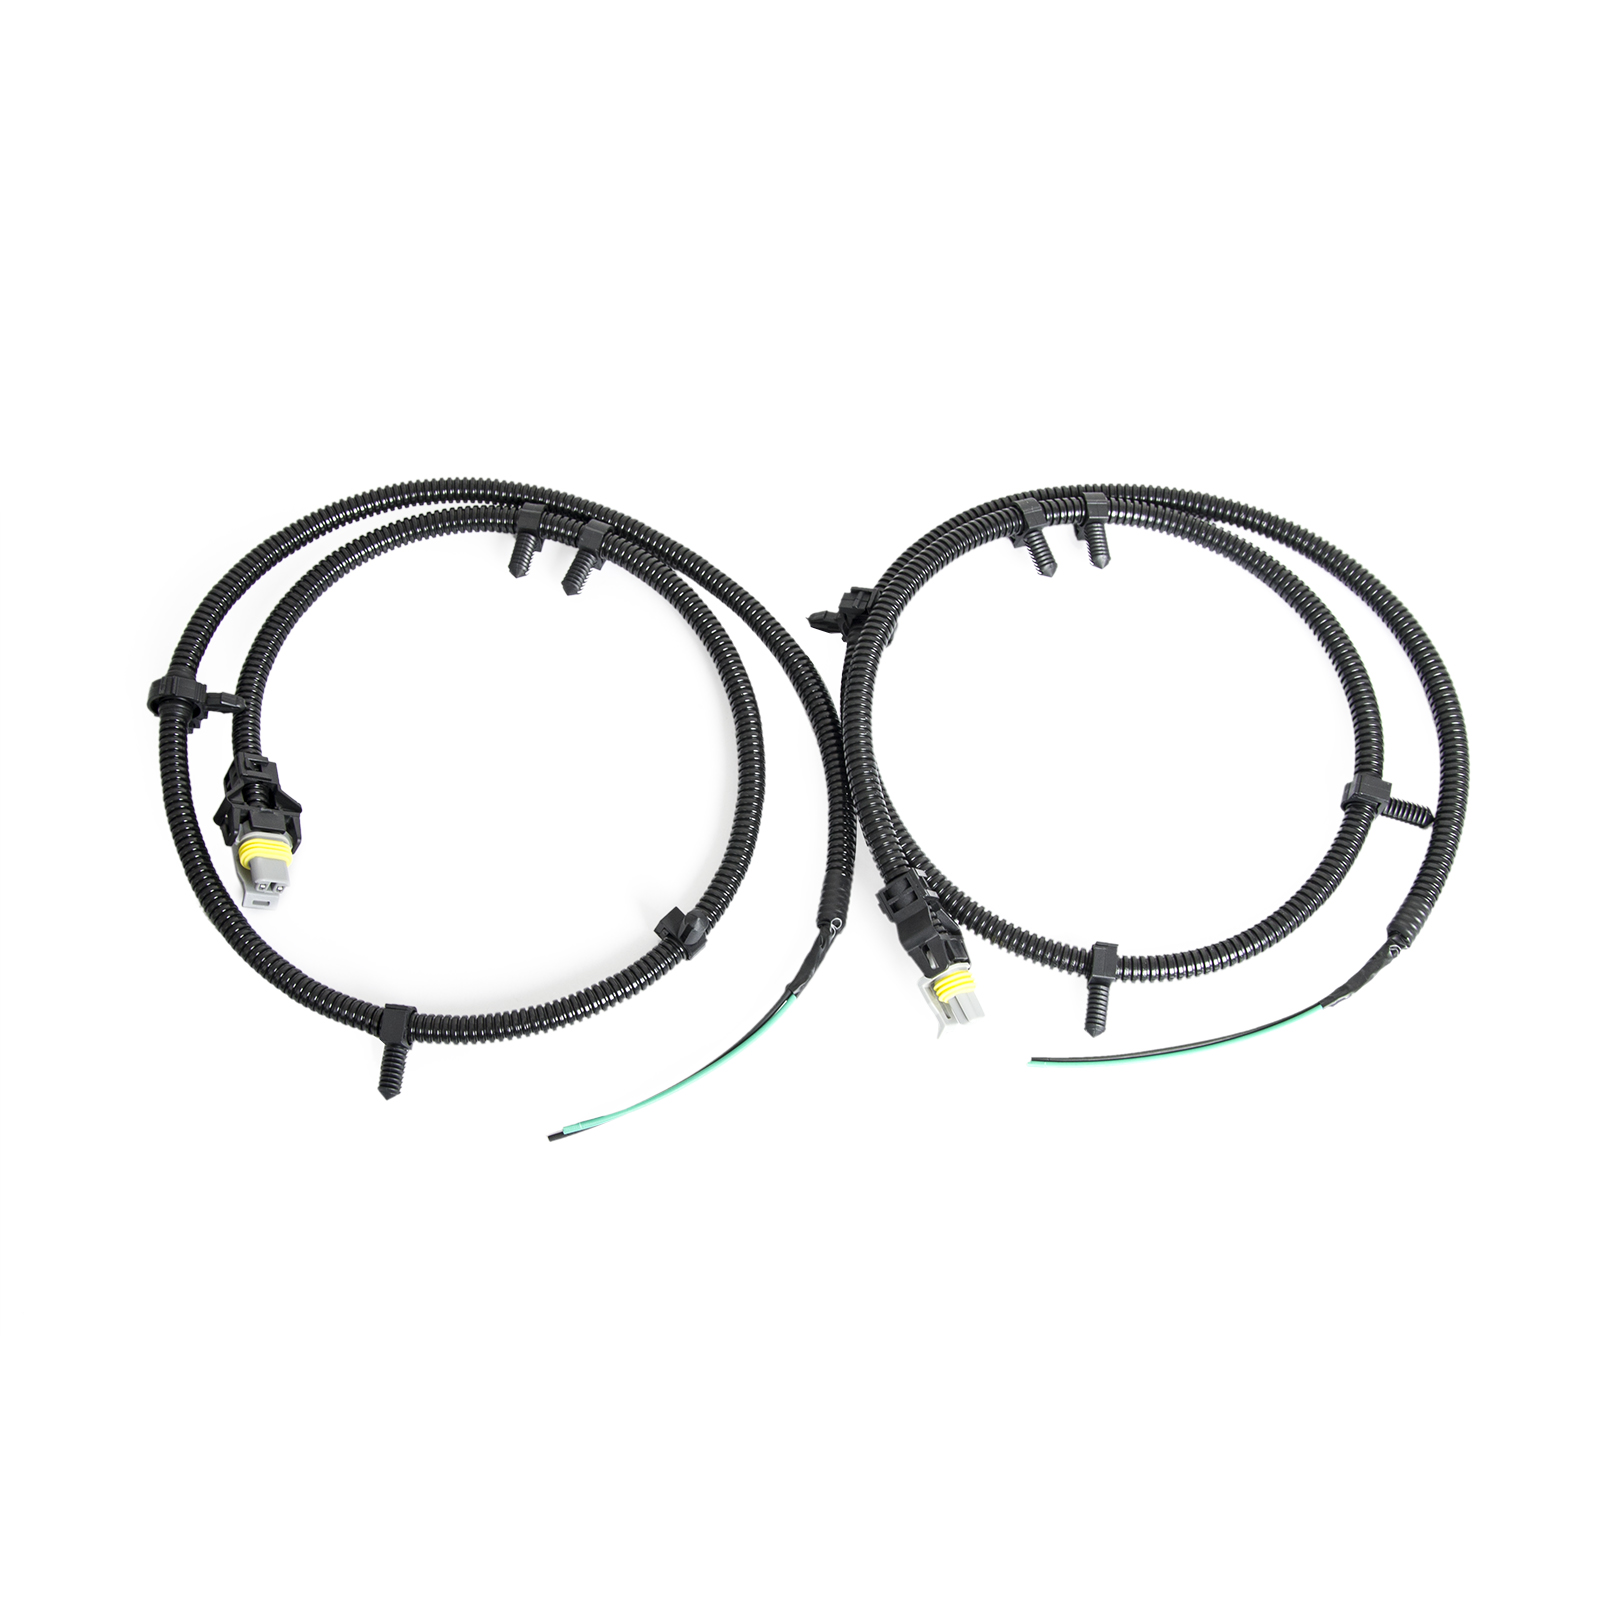 2pcs abs wheel speed sensor wire harness plug pigtail for. Black Bedroom Furniture Sets. Home Design Ideas